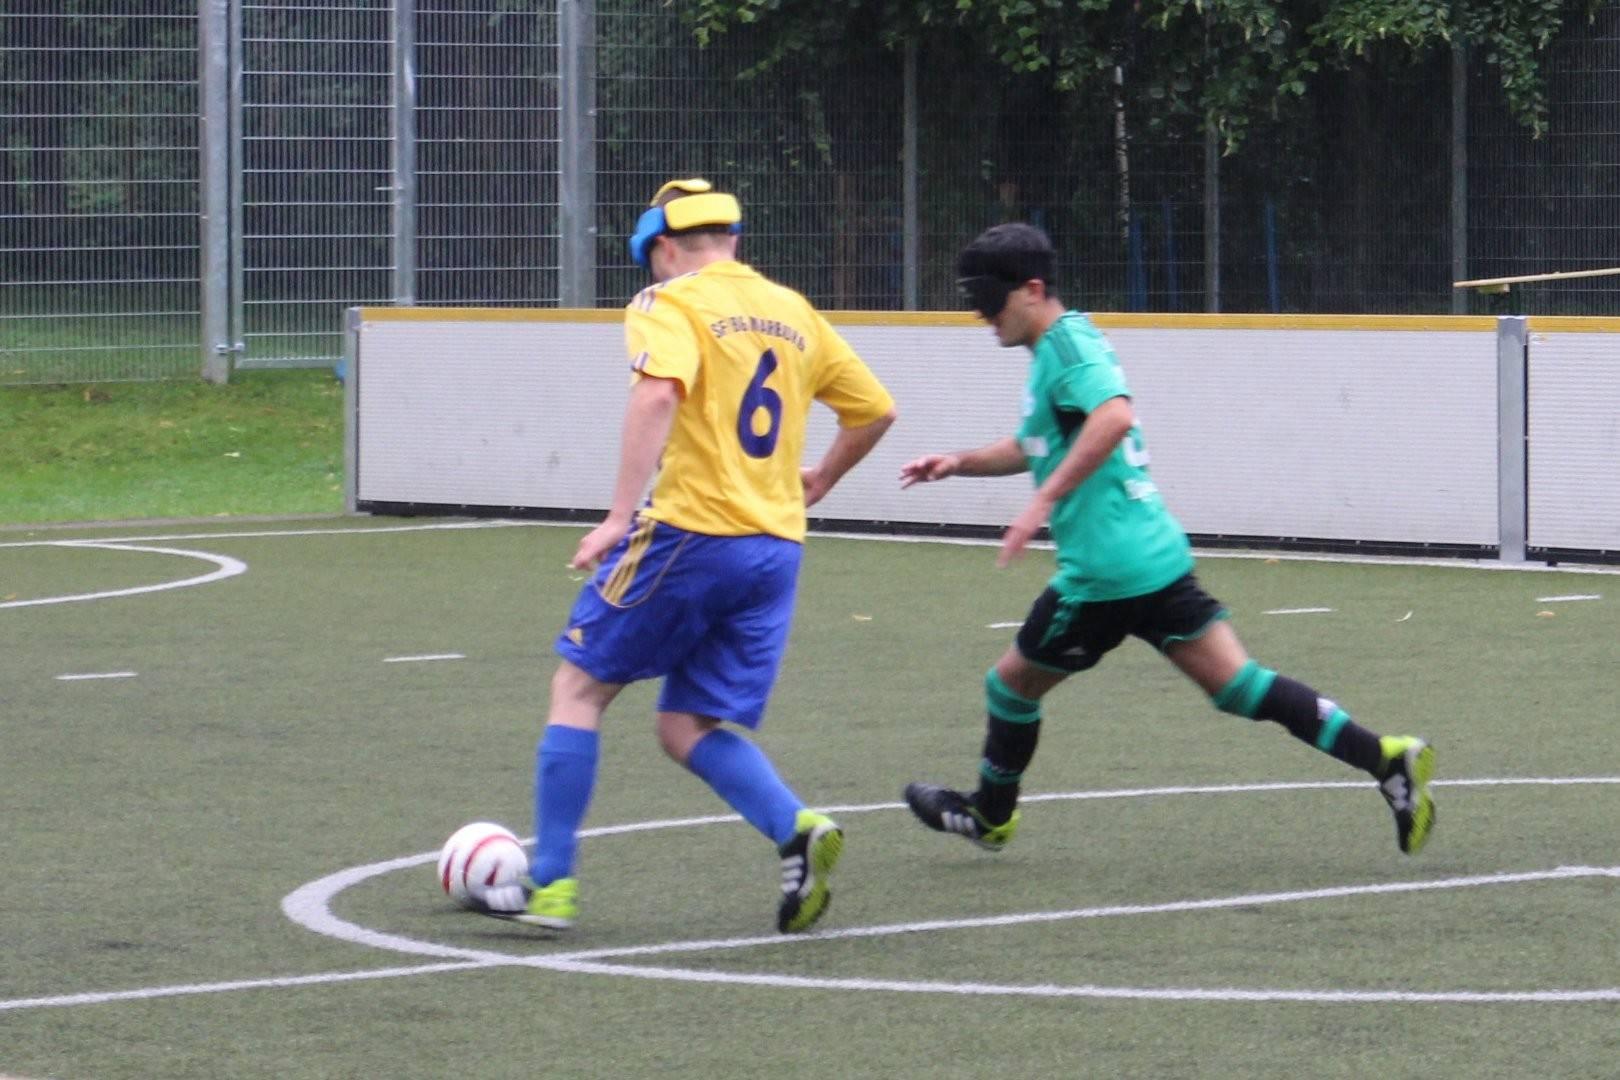 Wettrennen um den Ball